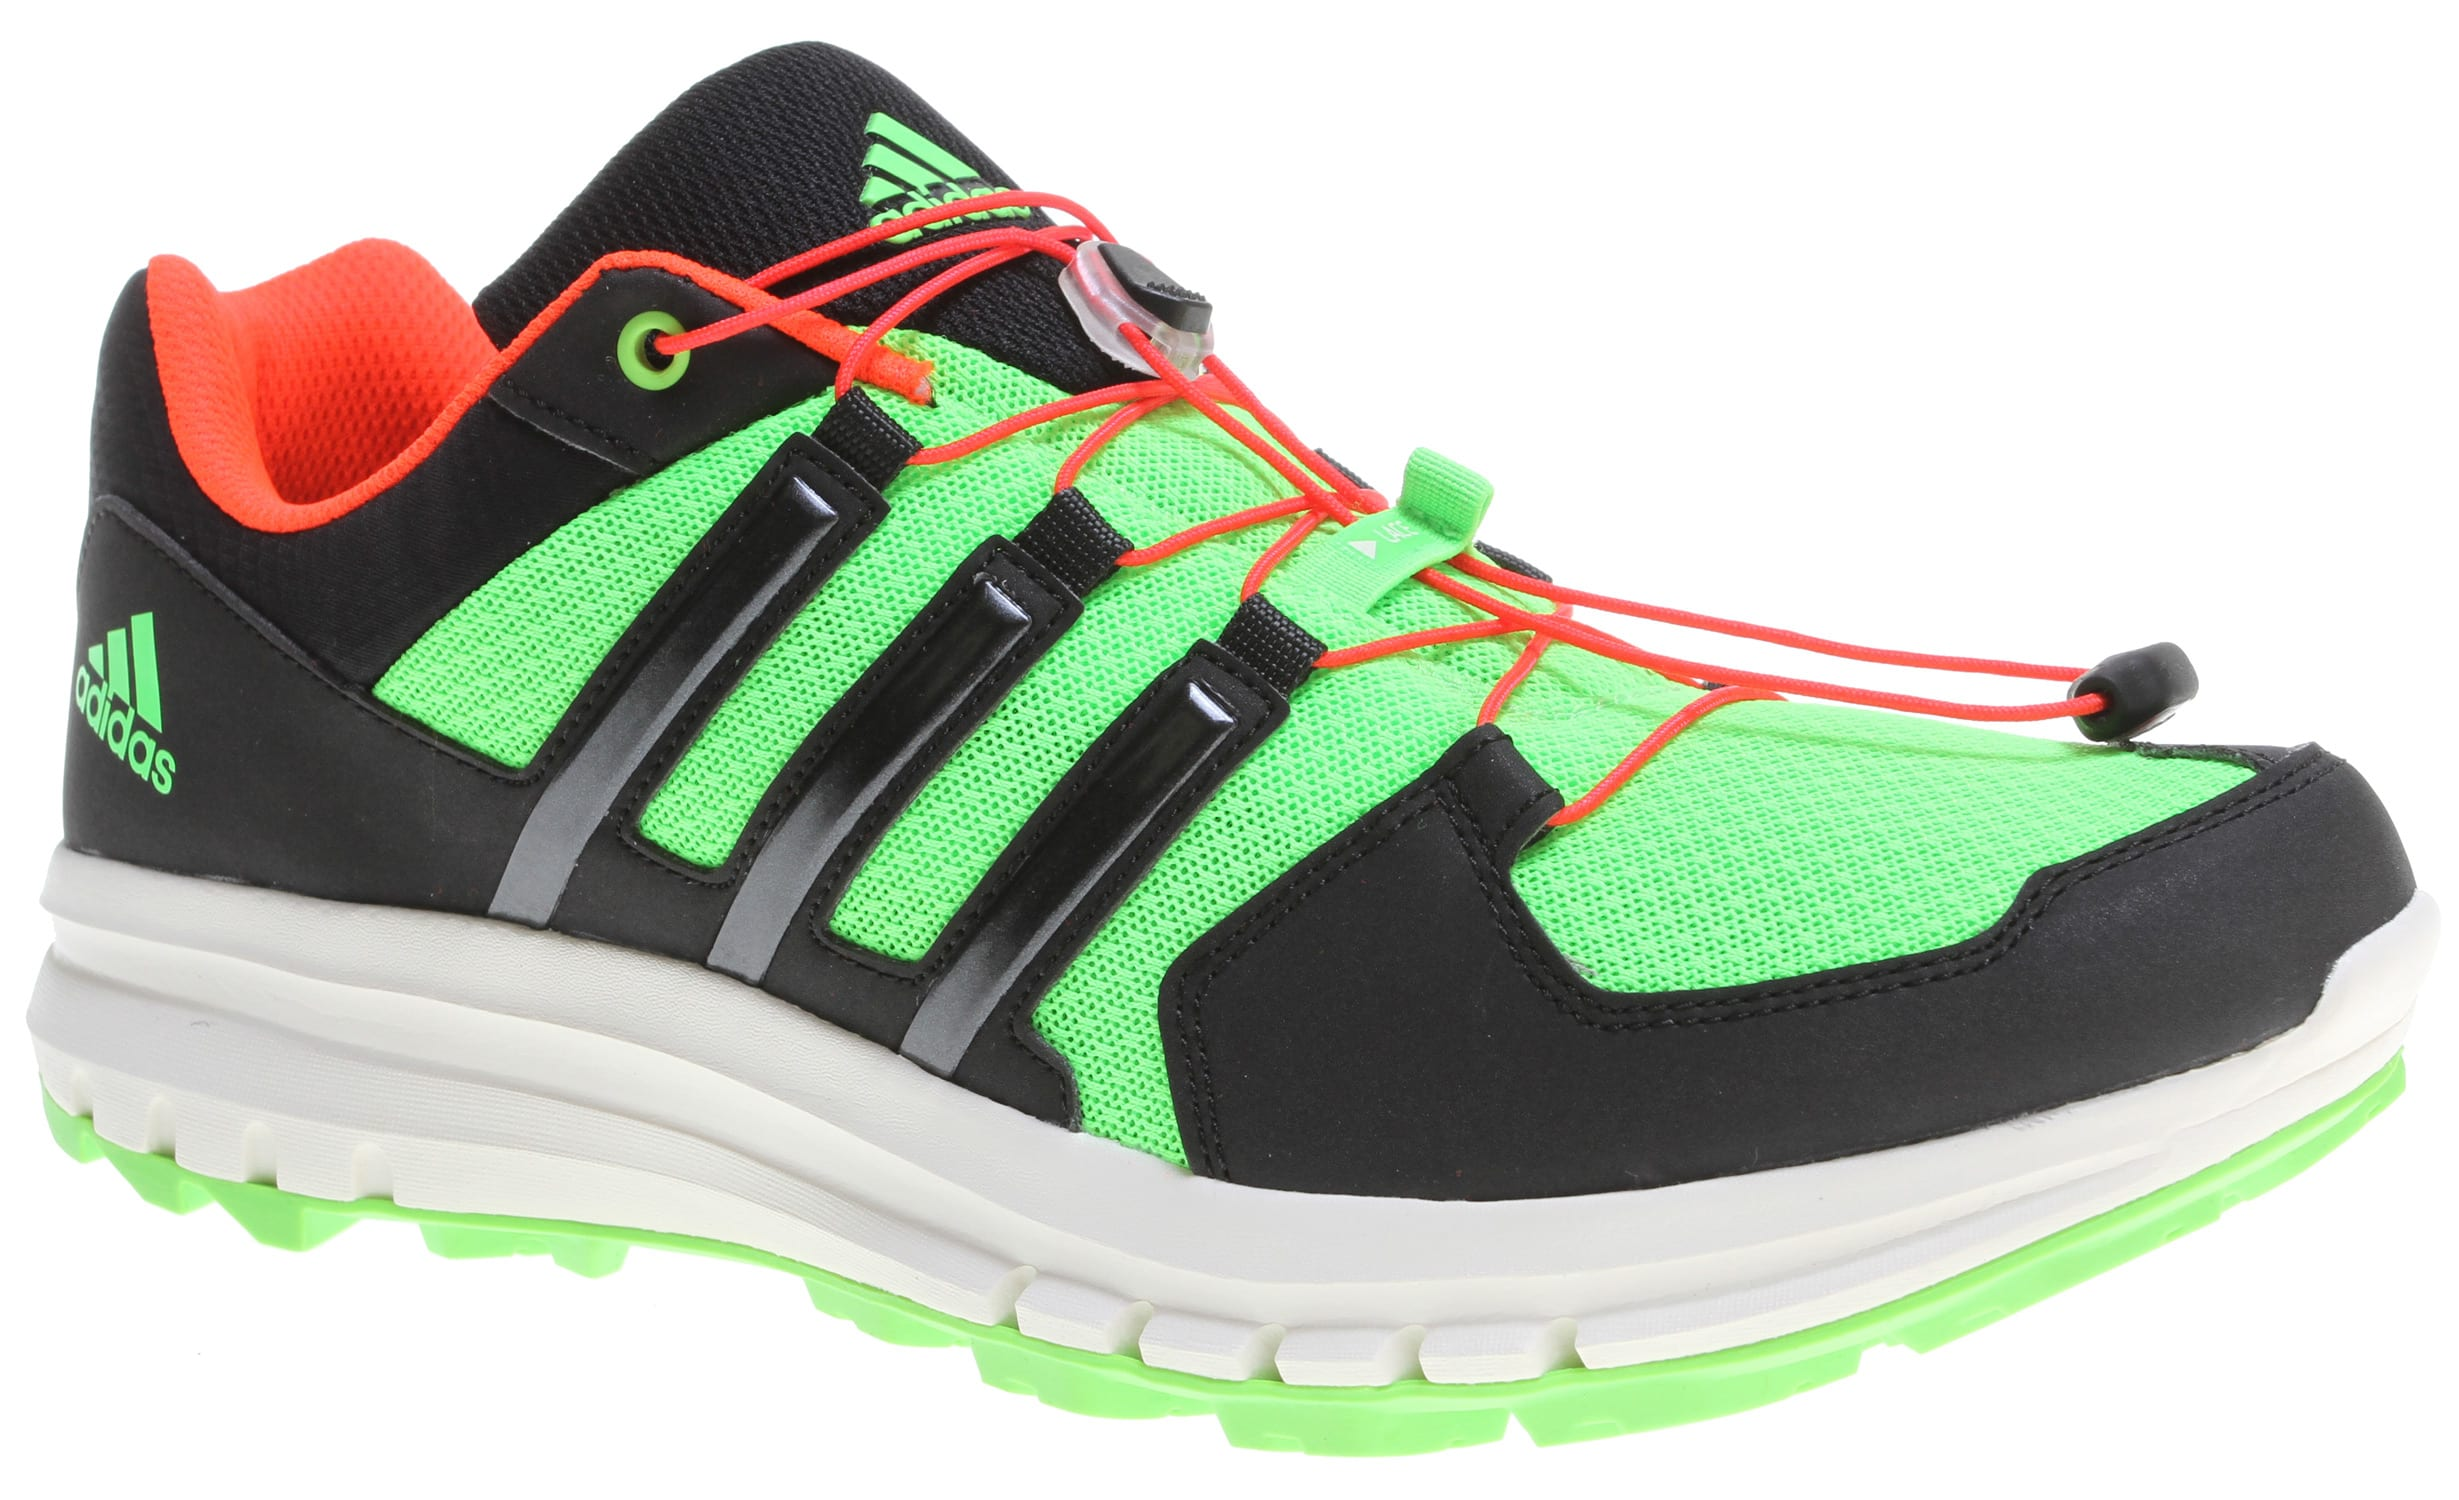 purchase cheap 98665 5b7aa Adidas Duramo Cross Trail Hiking Shoes - thumbnail 2